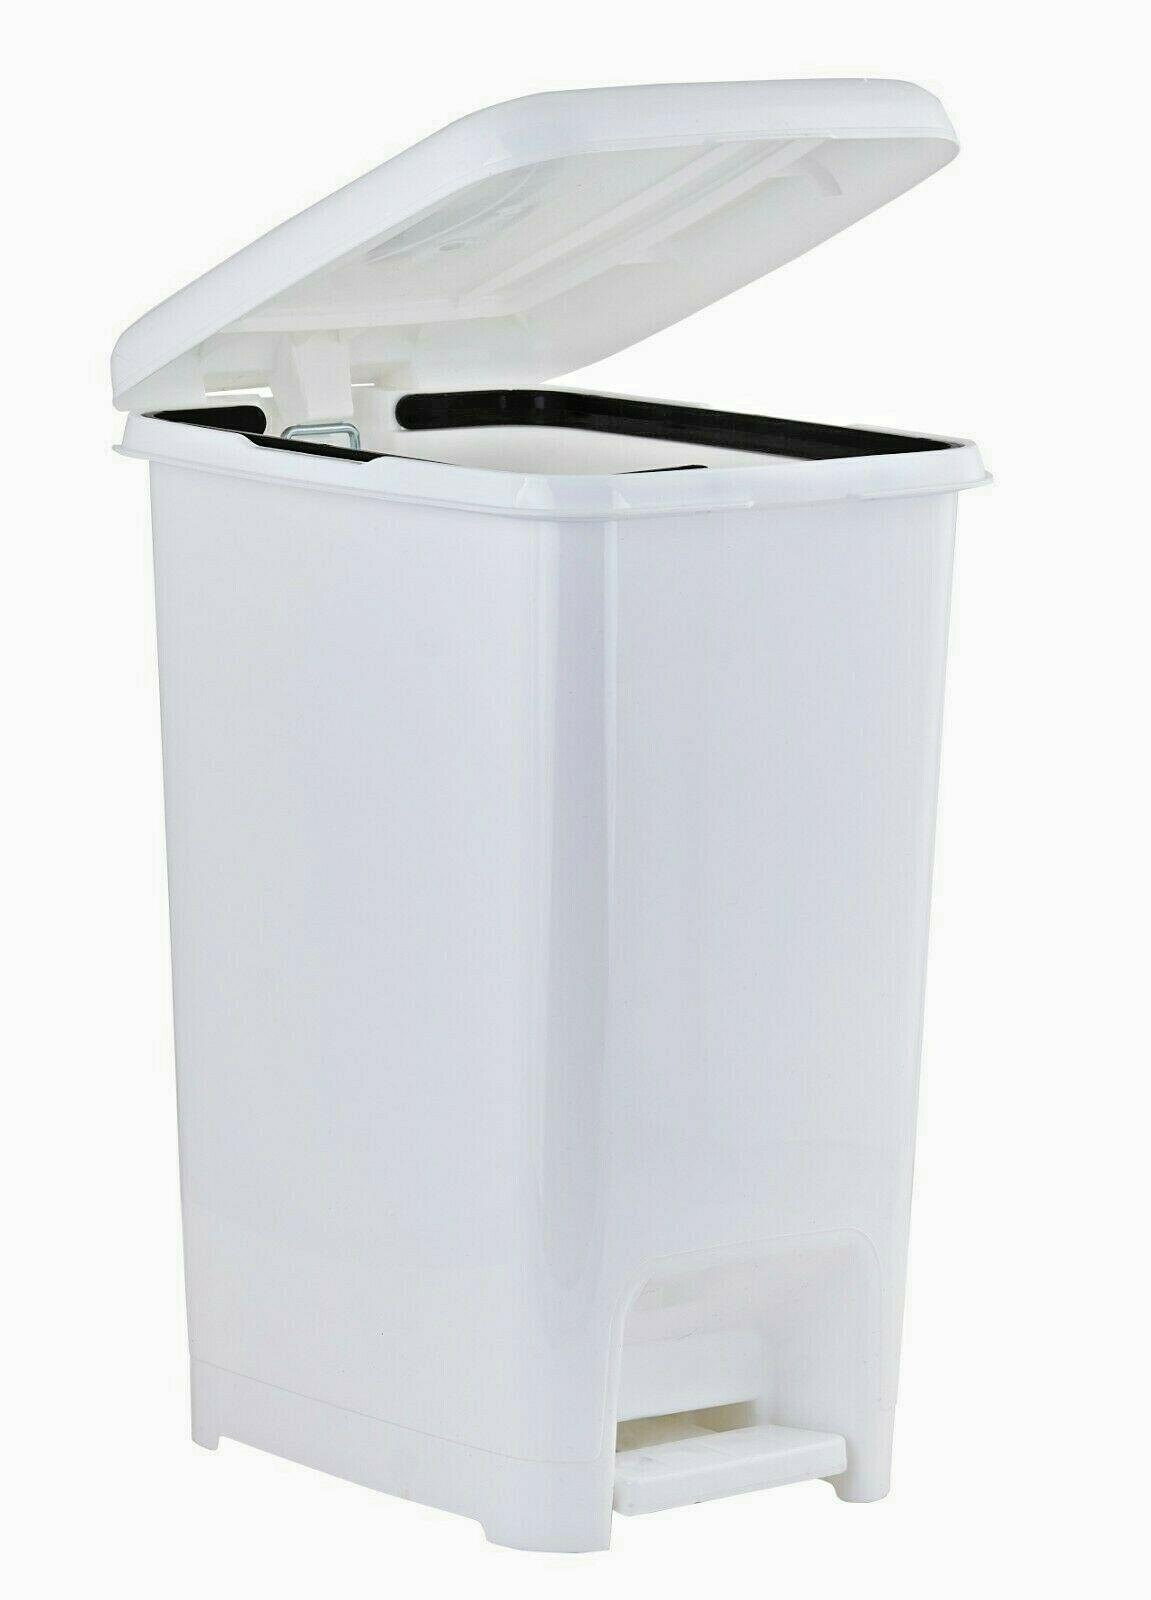 Download Wallpaper Plastic White Kitchen Trash Can Lid